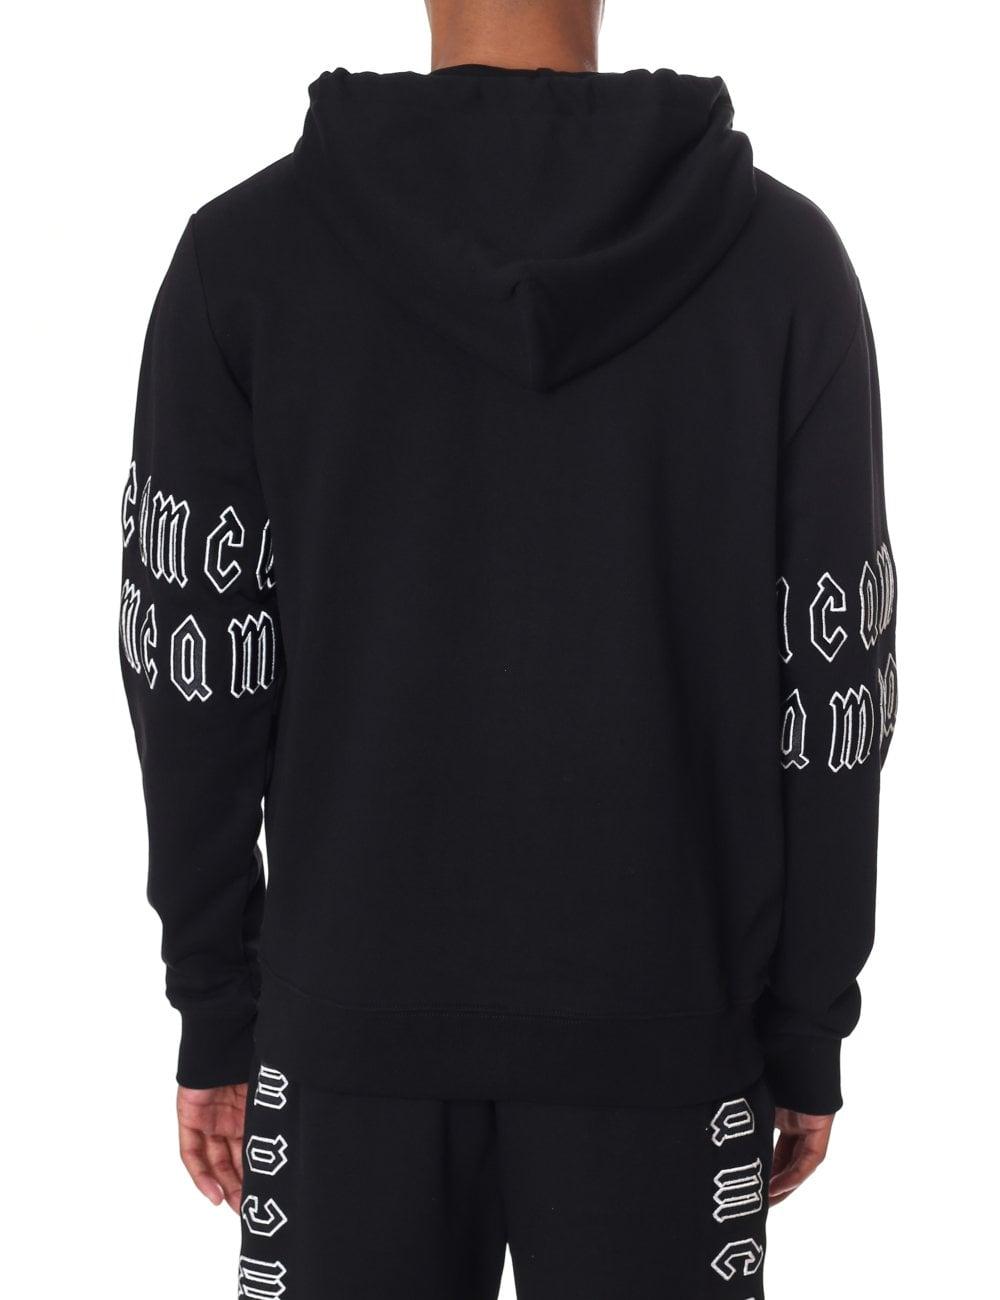 McQ by Alexander McQueen Men s Gothic Repeat Logo Zip Through ... 18fabbbf1d7f